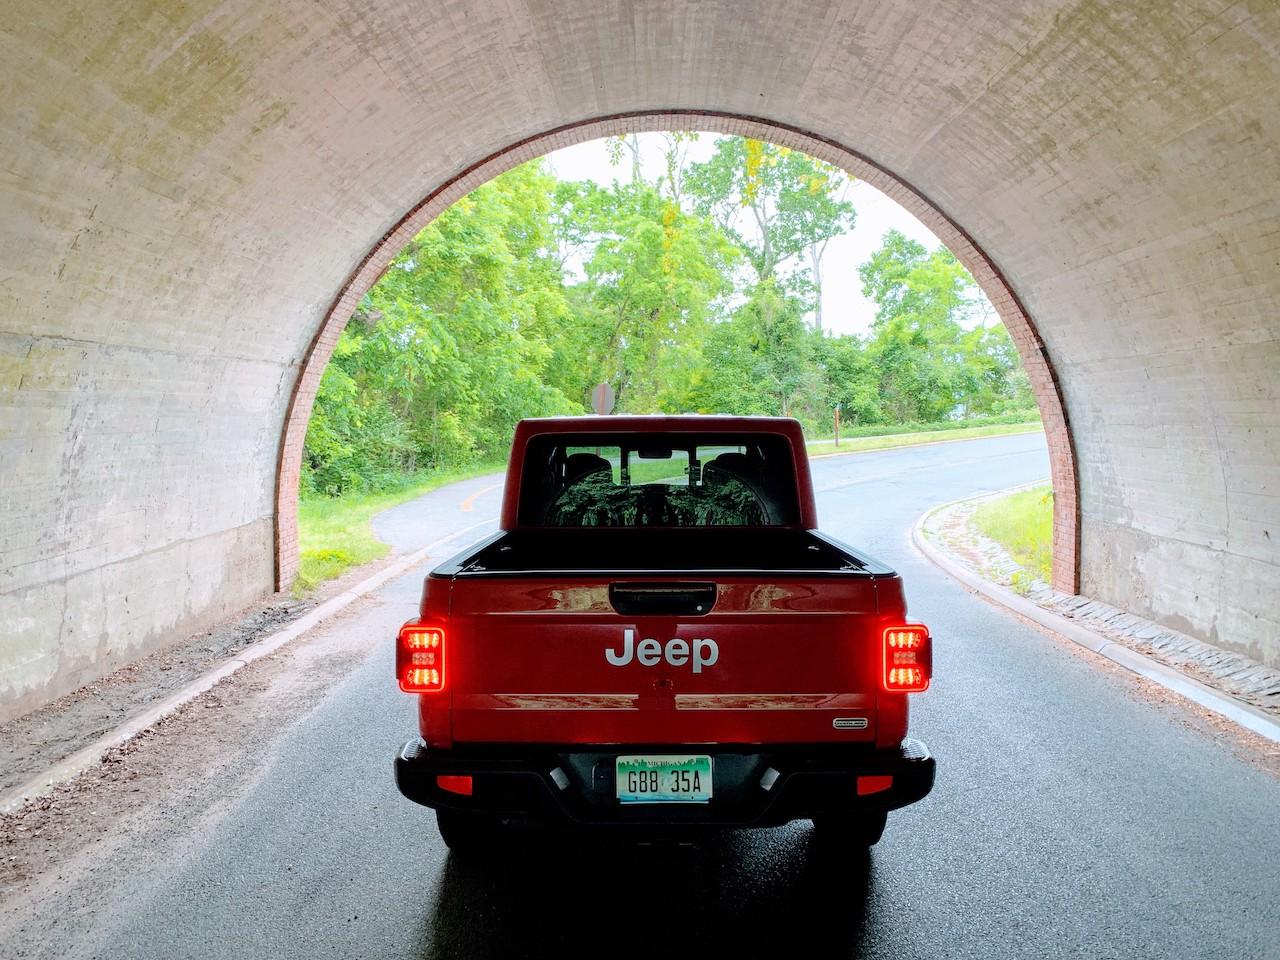 Jeep Gladiator rear